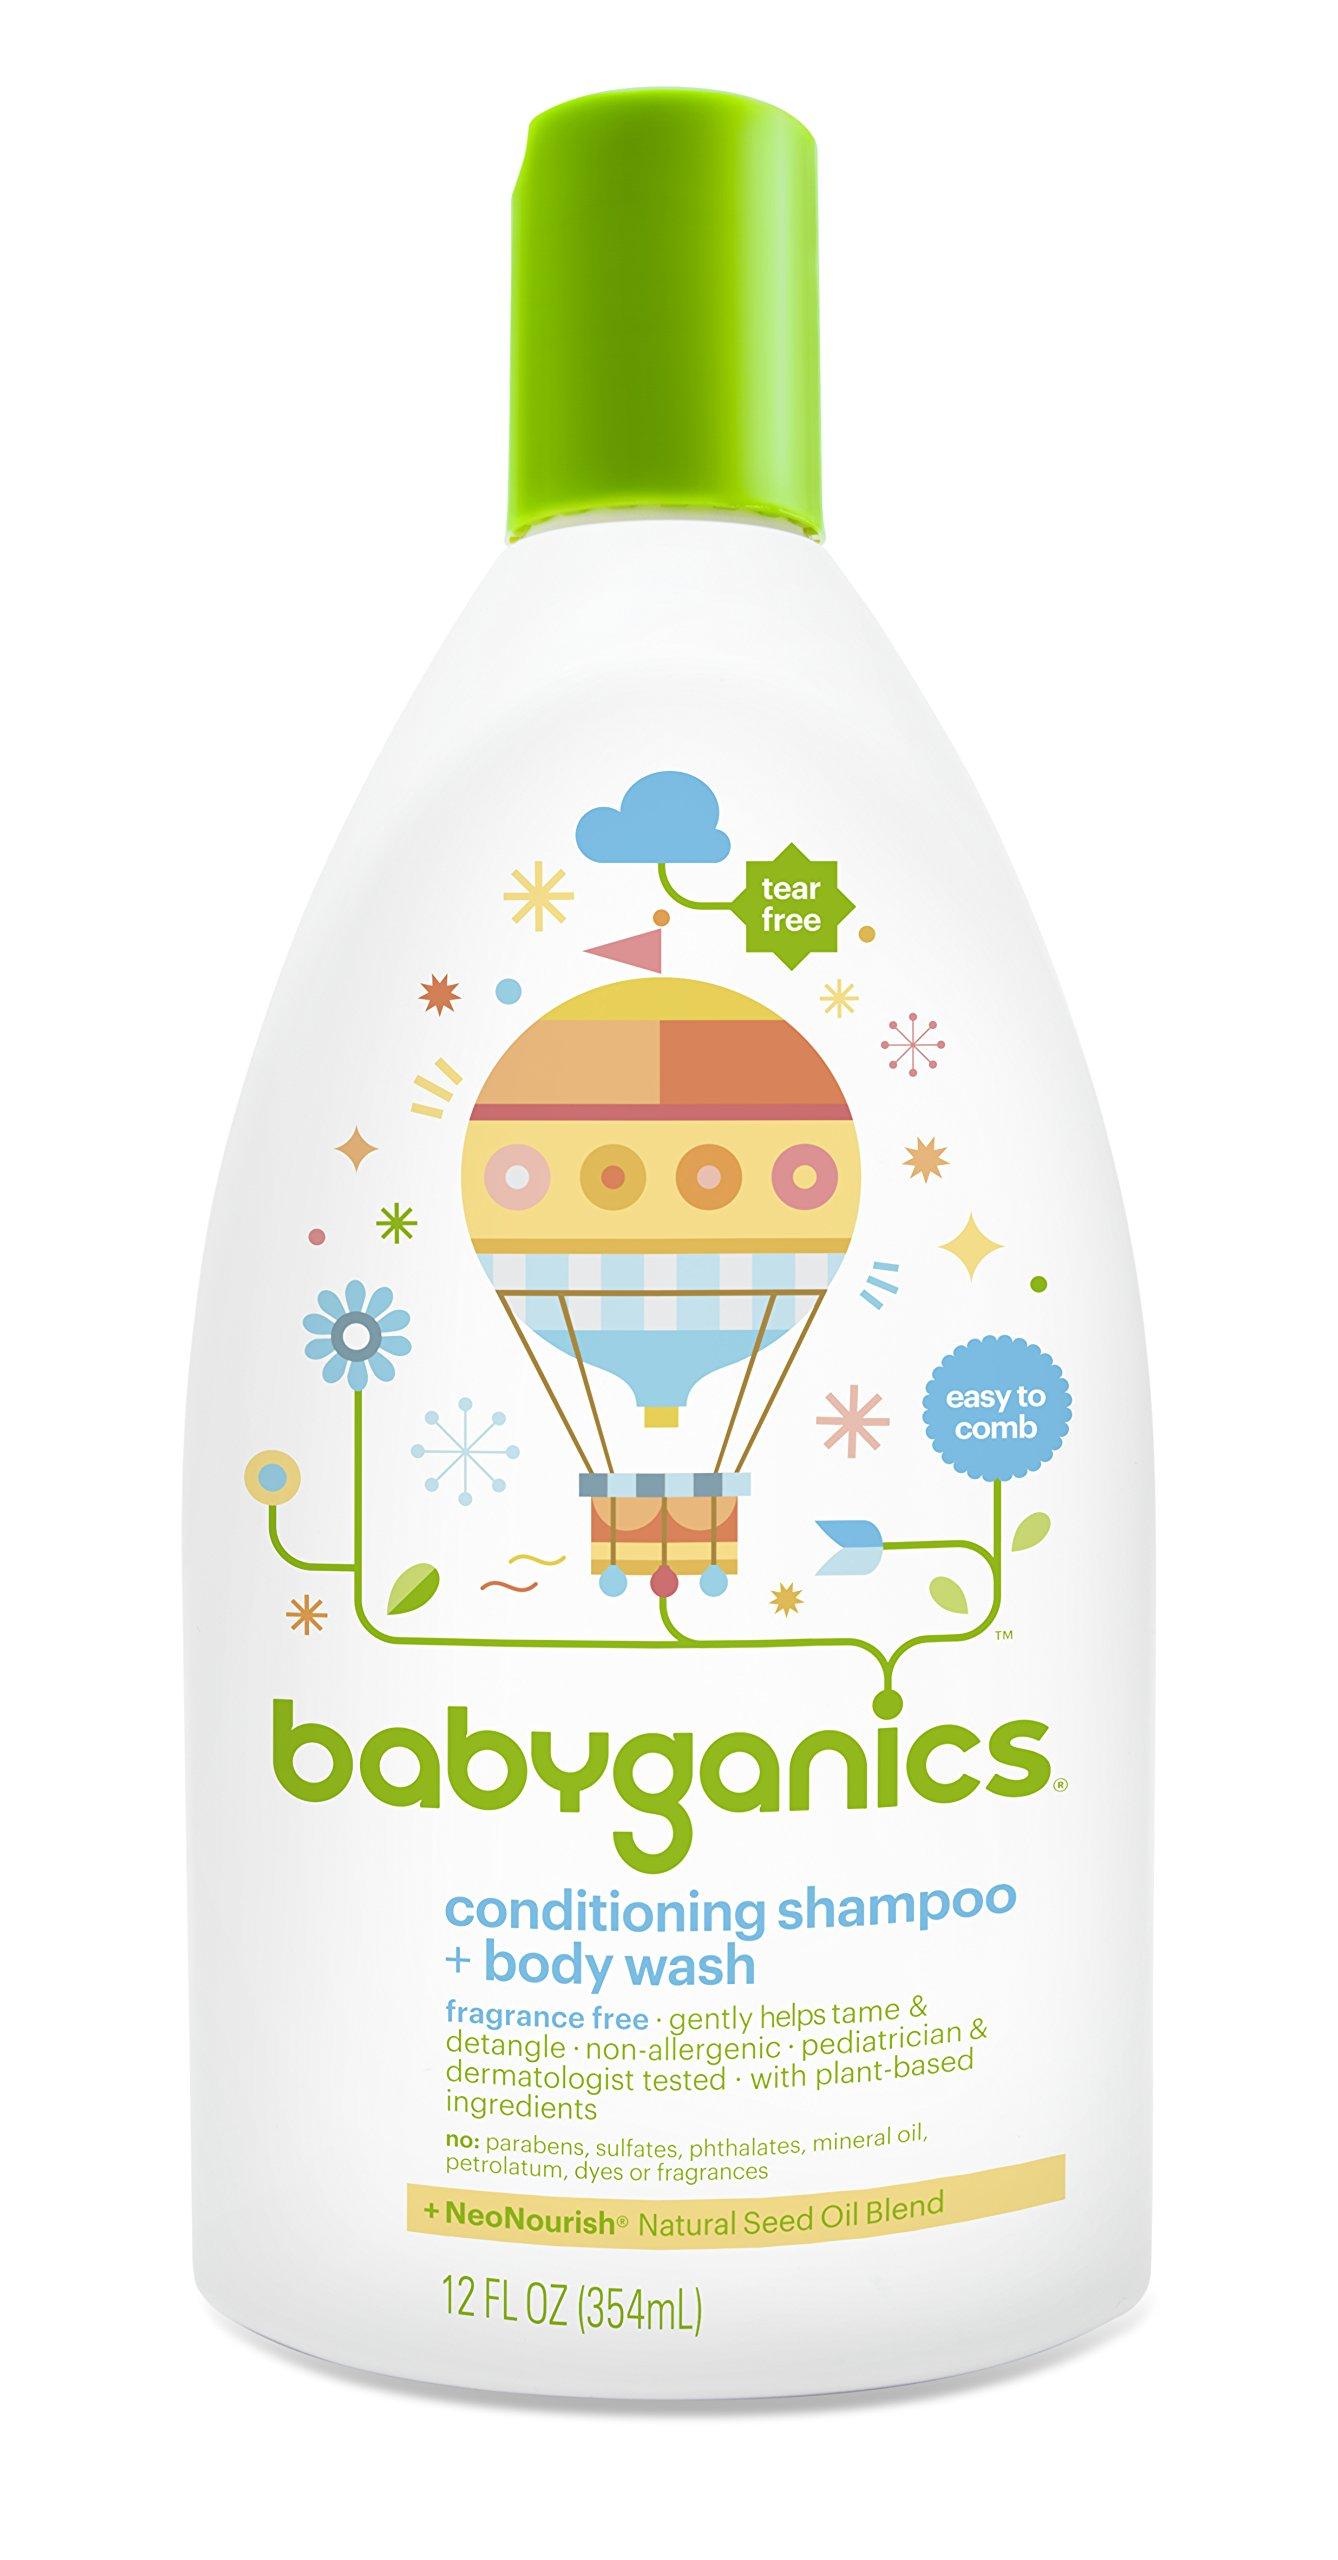 Babyganics Conditioning Fragrance Free Baby Shampoo and Bodywash, 3 Count by Babyganics